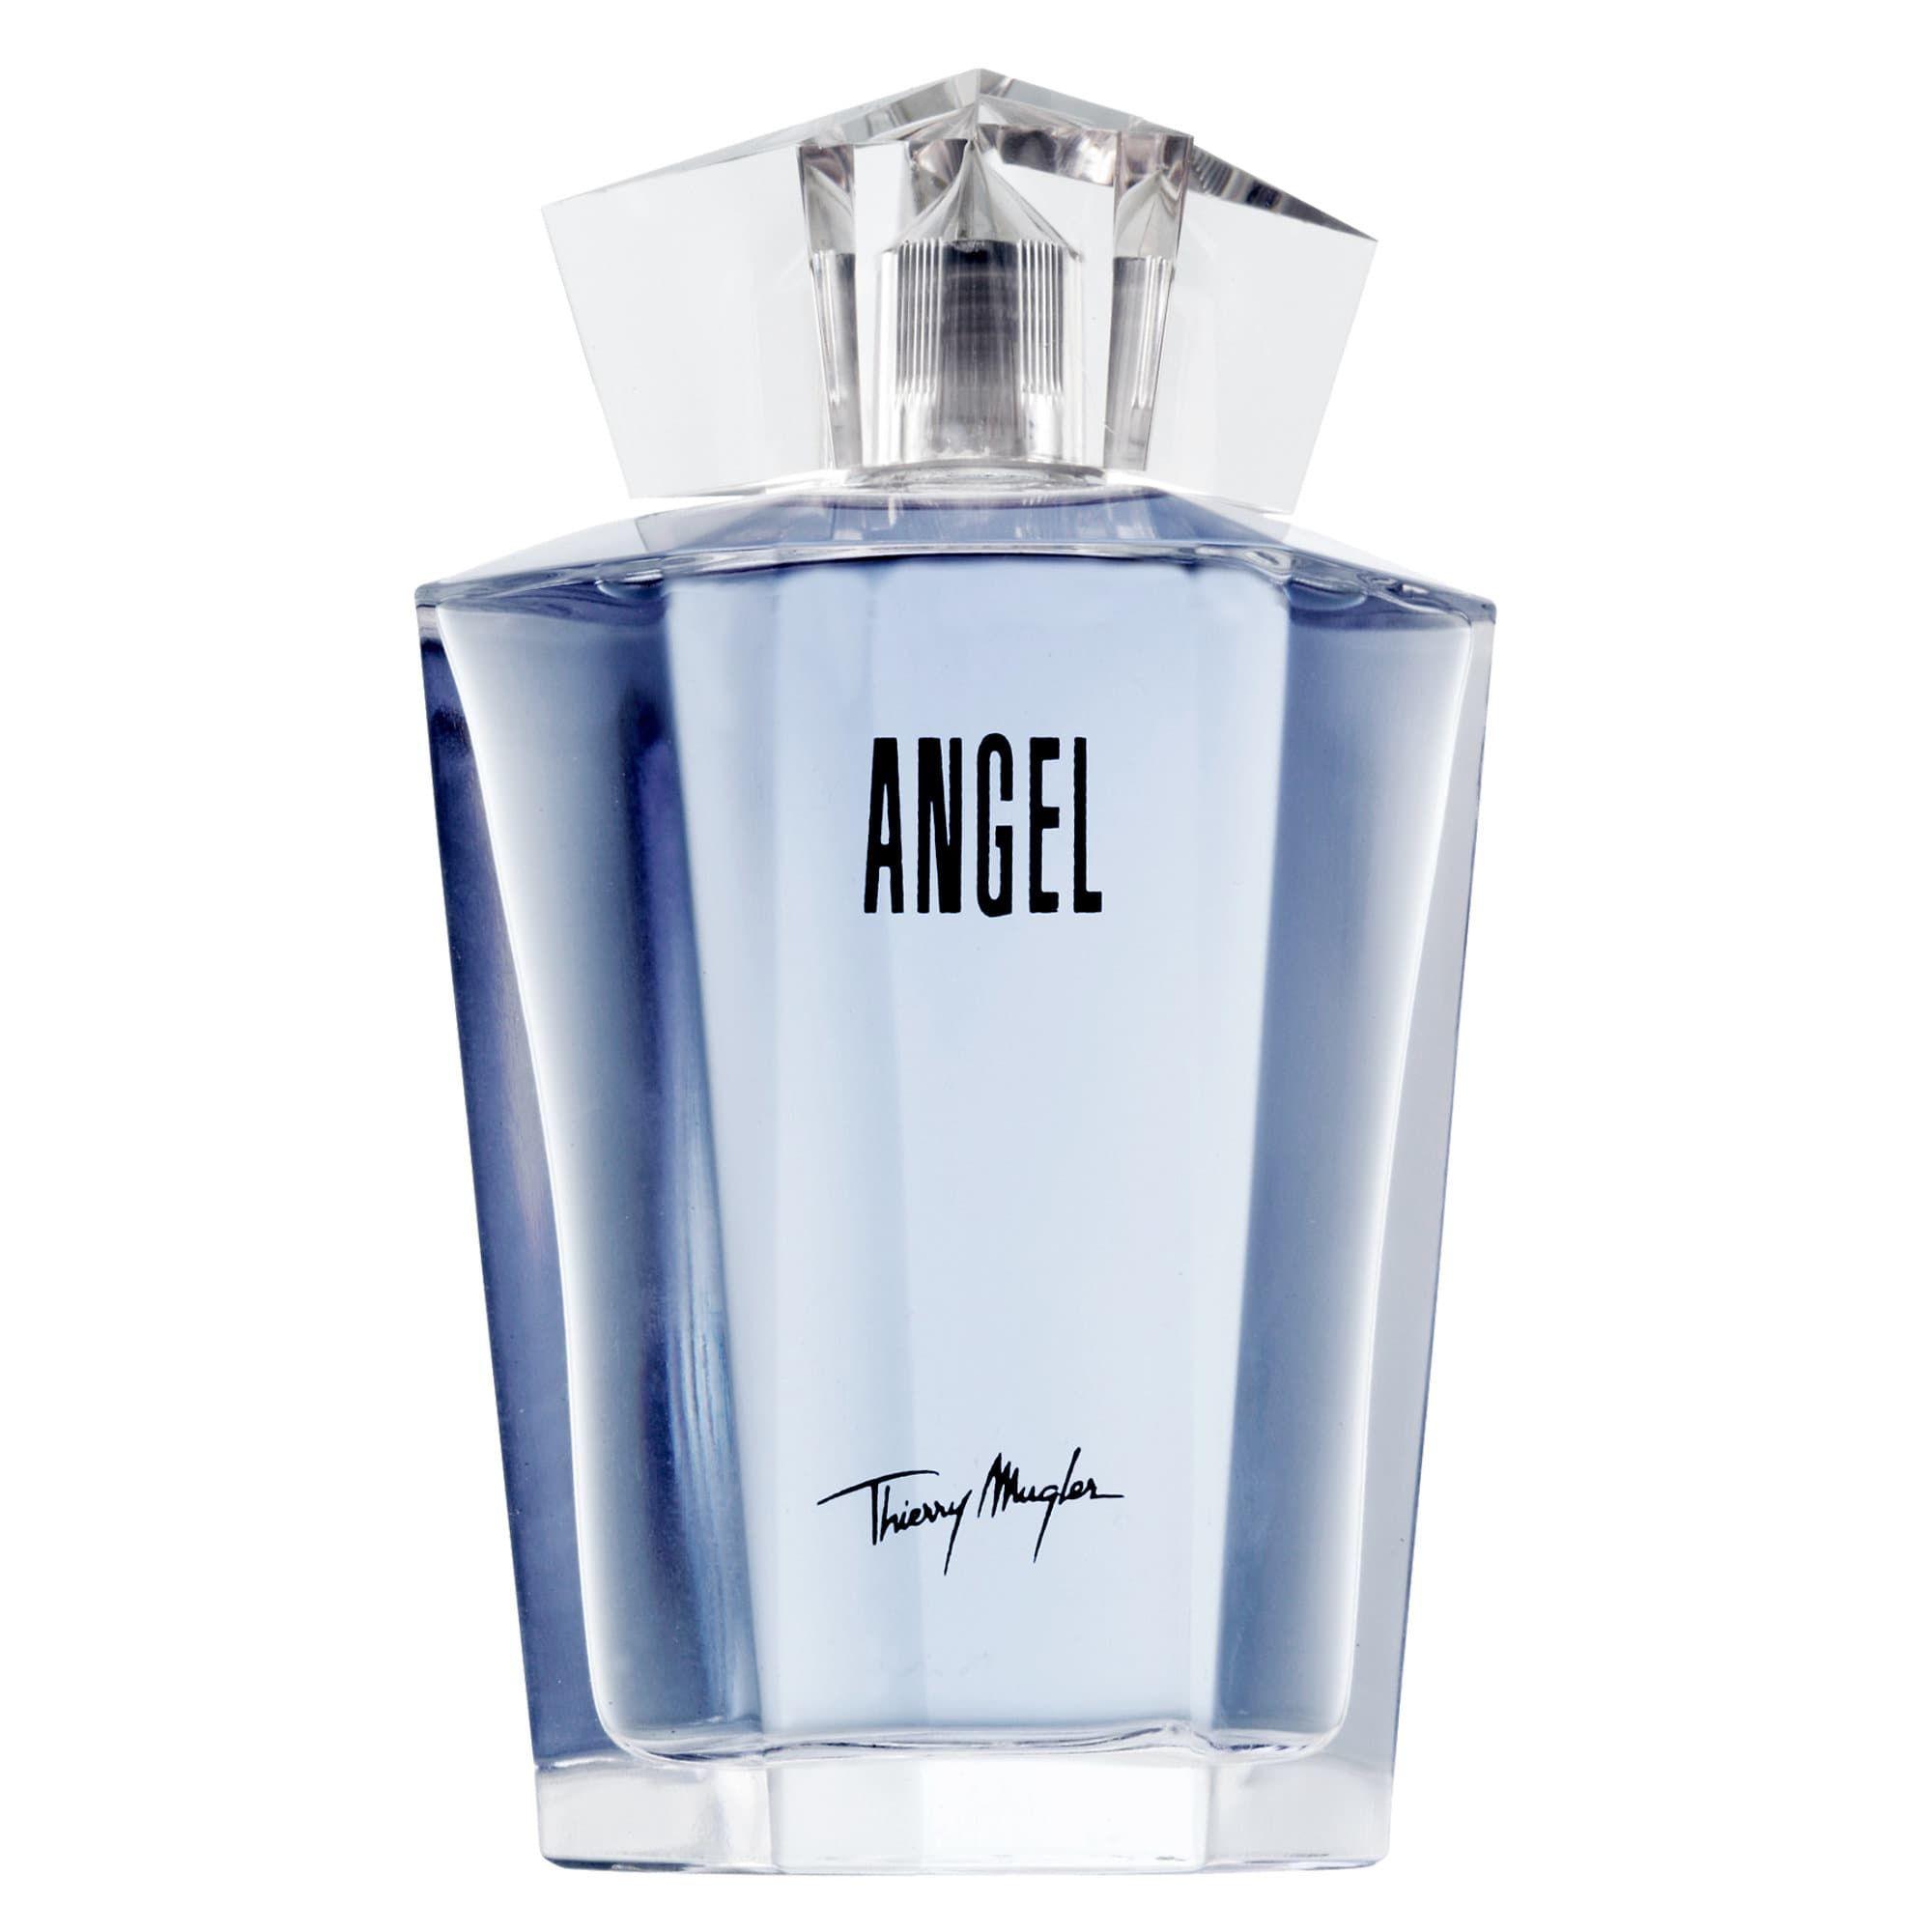 Mugler Angel 34 Oz 100 Ml Eau De Parfum Rising Star Refillable